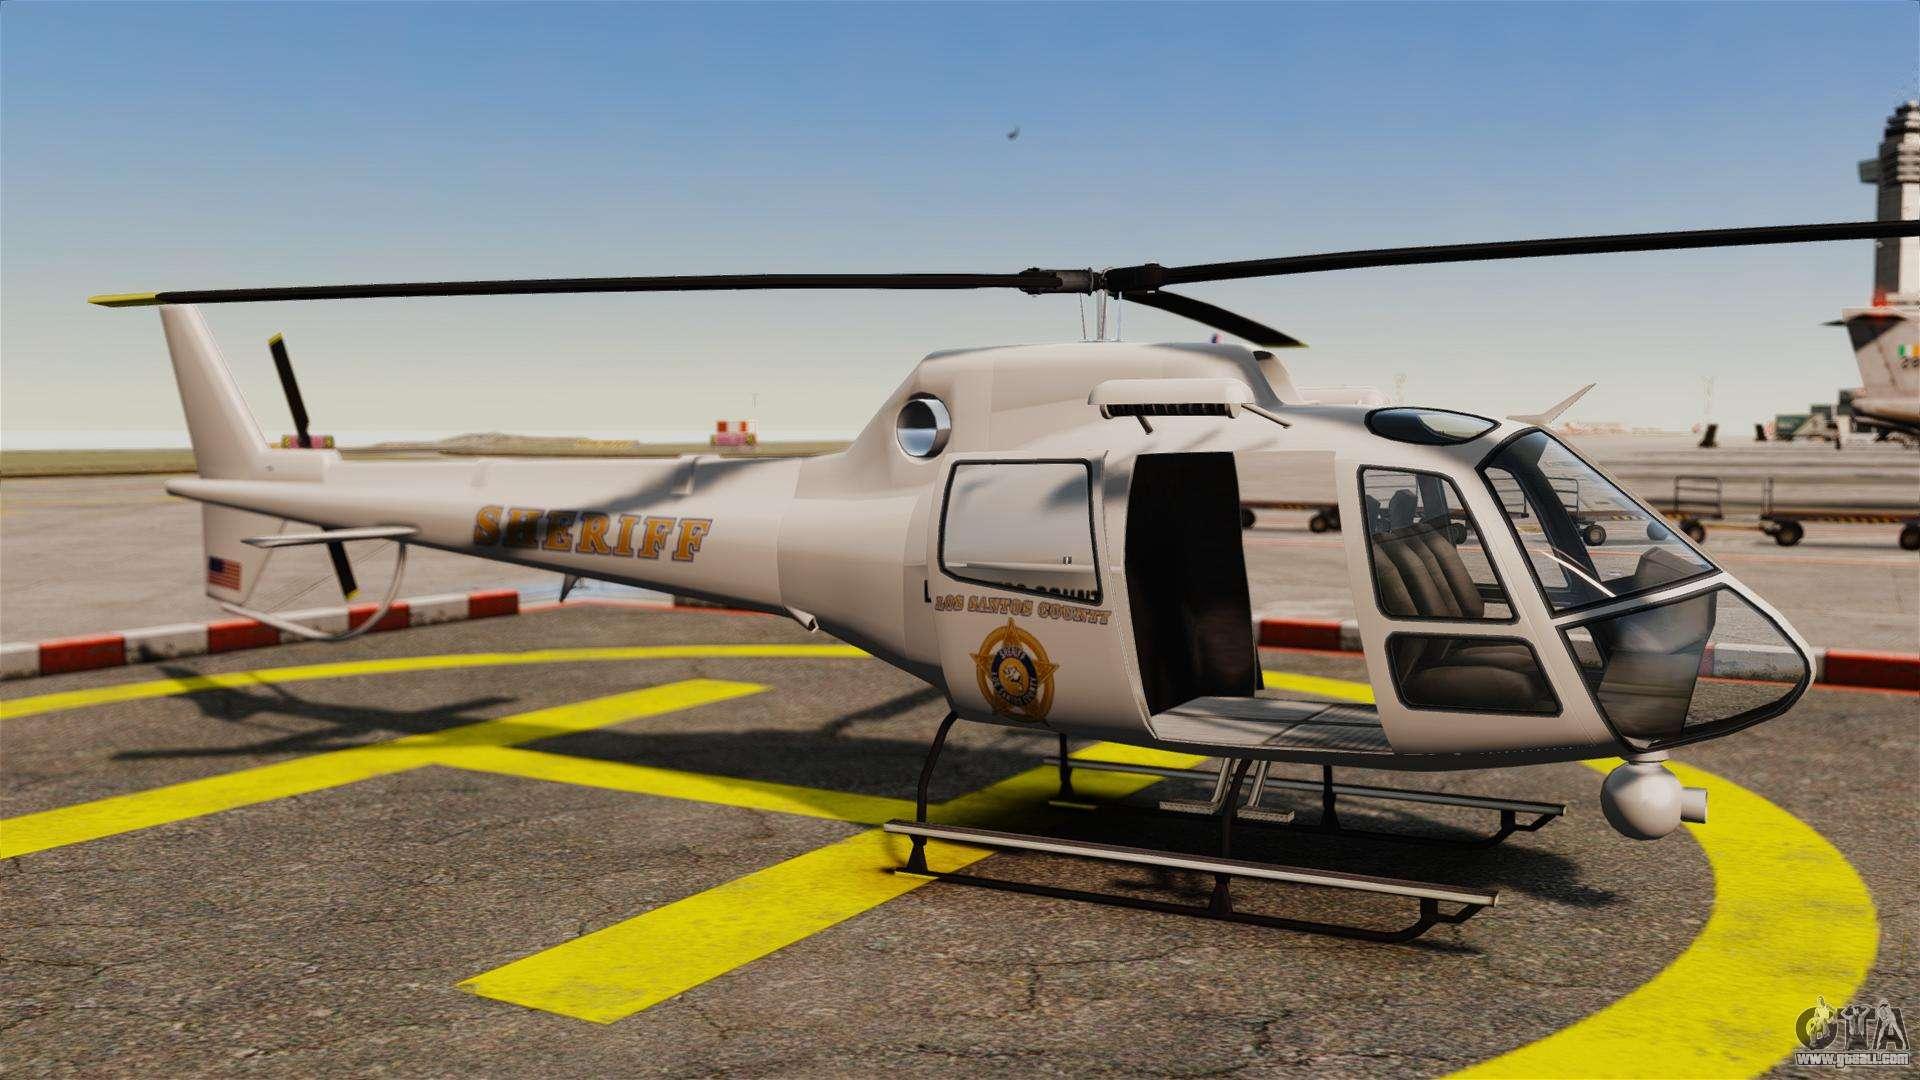 valkyrie helicopter with 34145 Gta V Police Maverick on File Cargobob GTAV RearDoorOpen furthermore 1361 likewise 104497653826178274 besides 34145 Gta V Police Maverick further Vf 171.